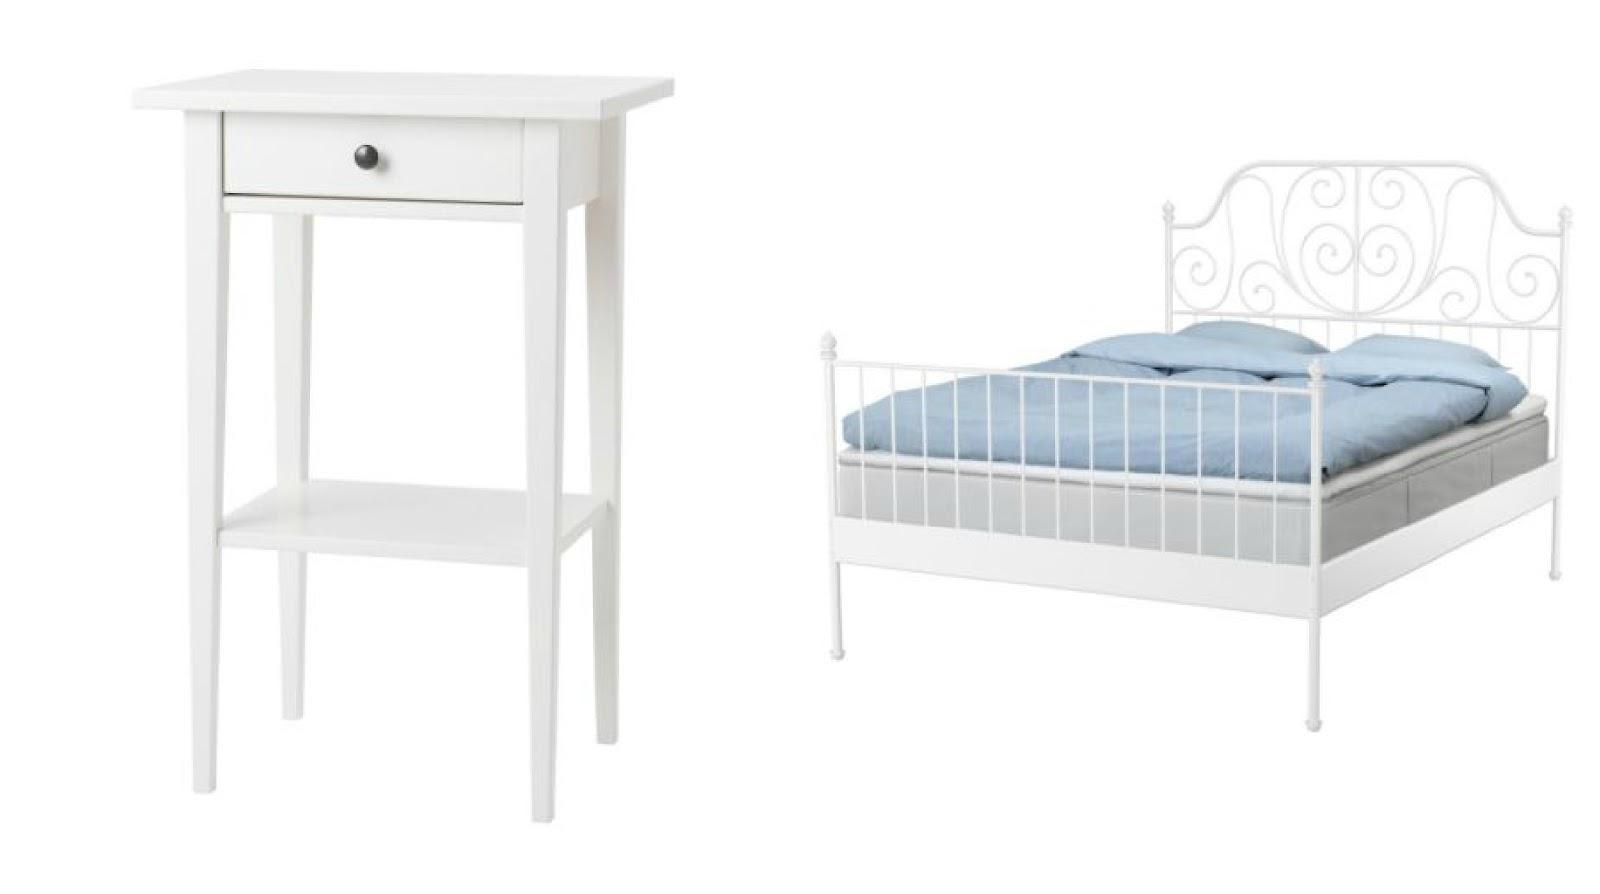 sabrina bald gehts wieder zu ikea. Black Bedroom Furniture Sets. Home Design Ideas